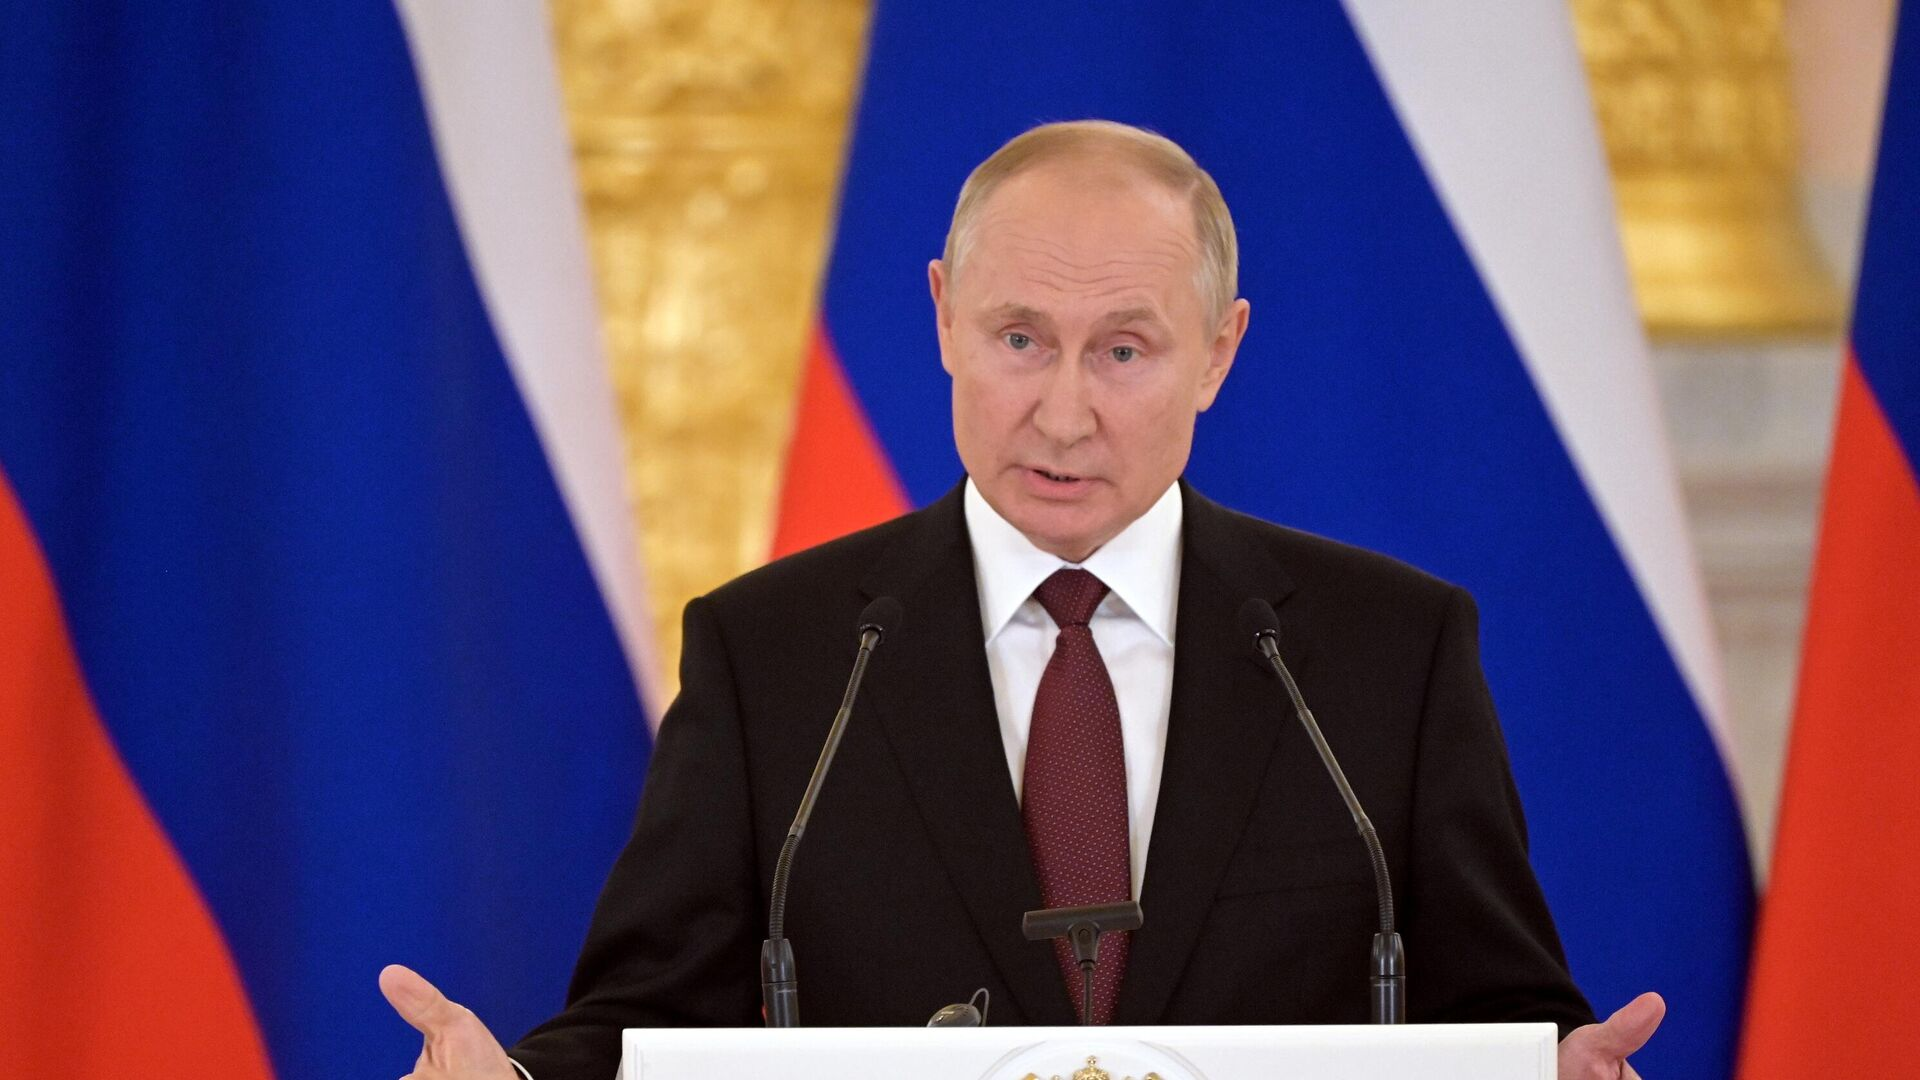 Predsednik Rusije Vladimir Putin - Sputnik Srbija, 1920, 08.10.2021